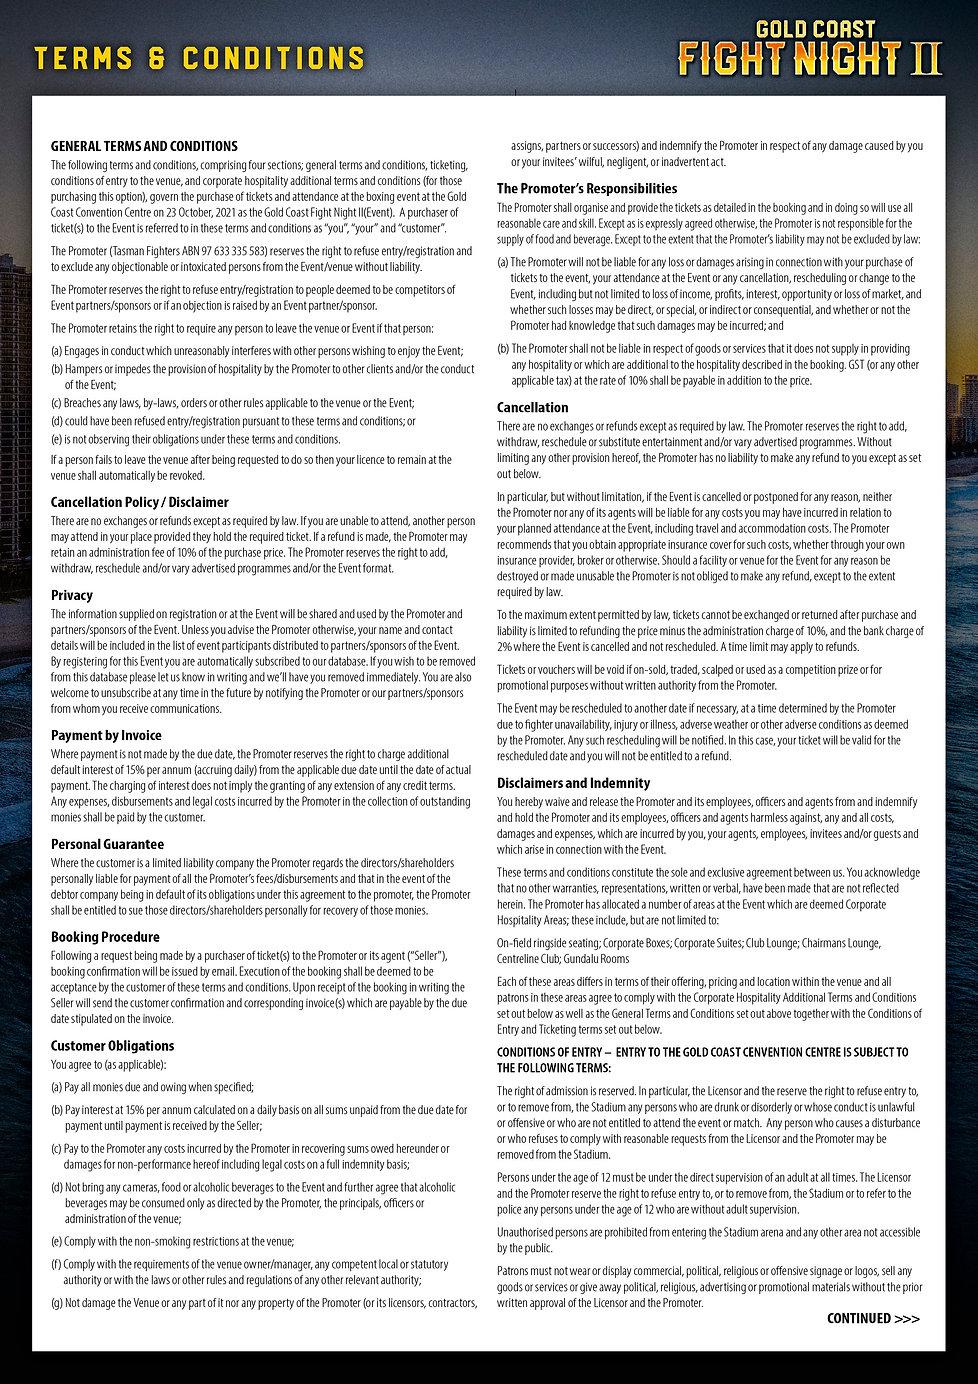 GCFN2_Corp Hosp Brochure_new Date5.jpg